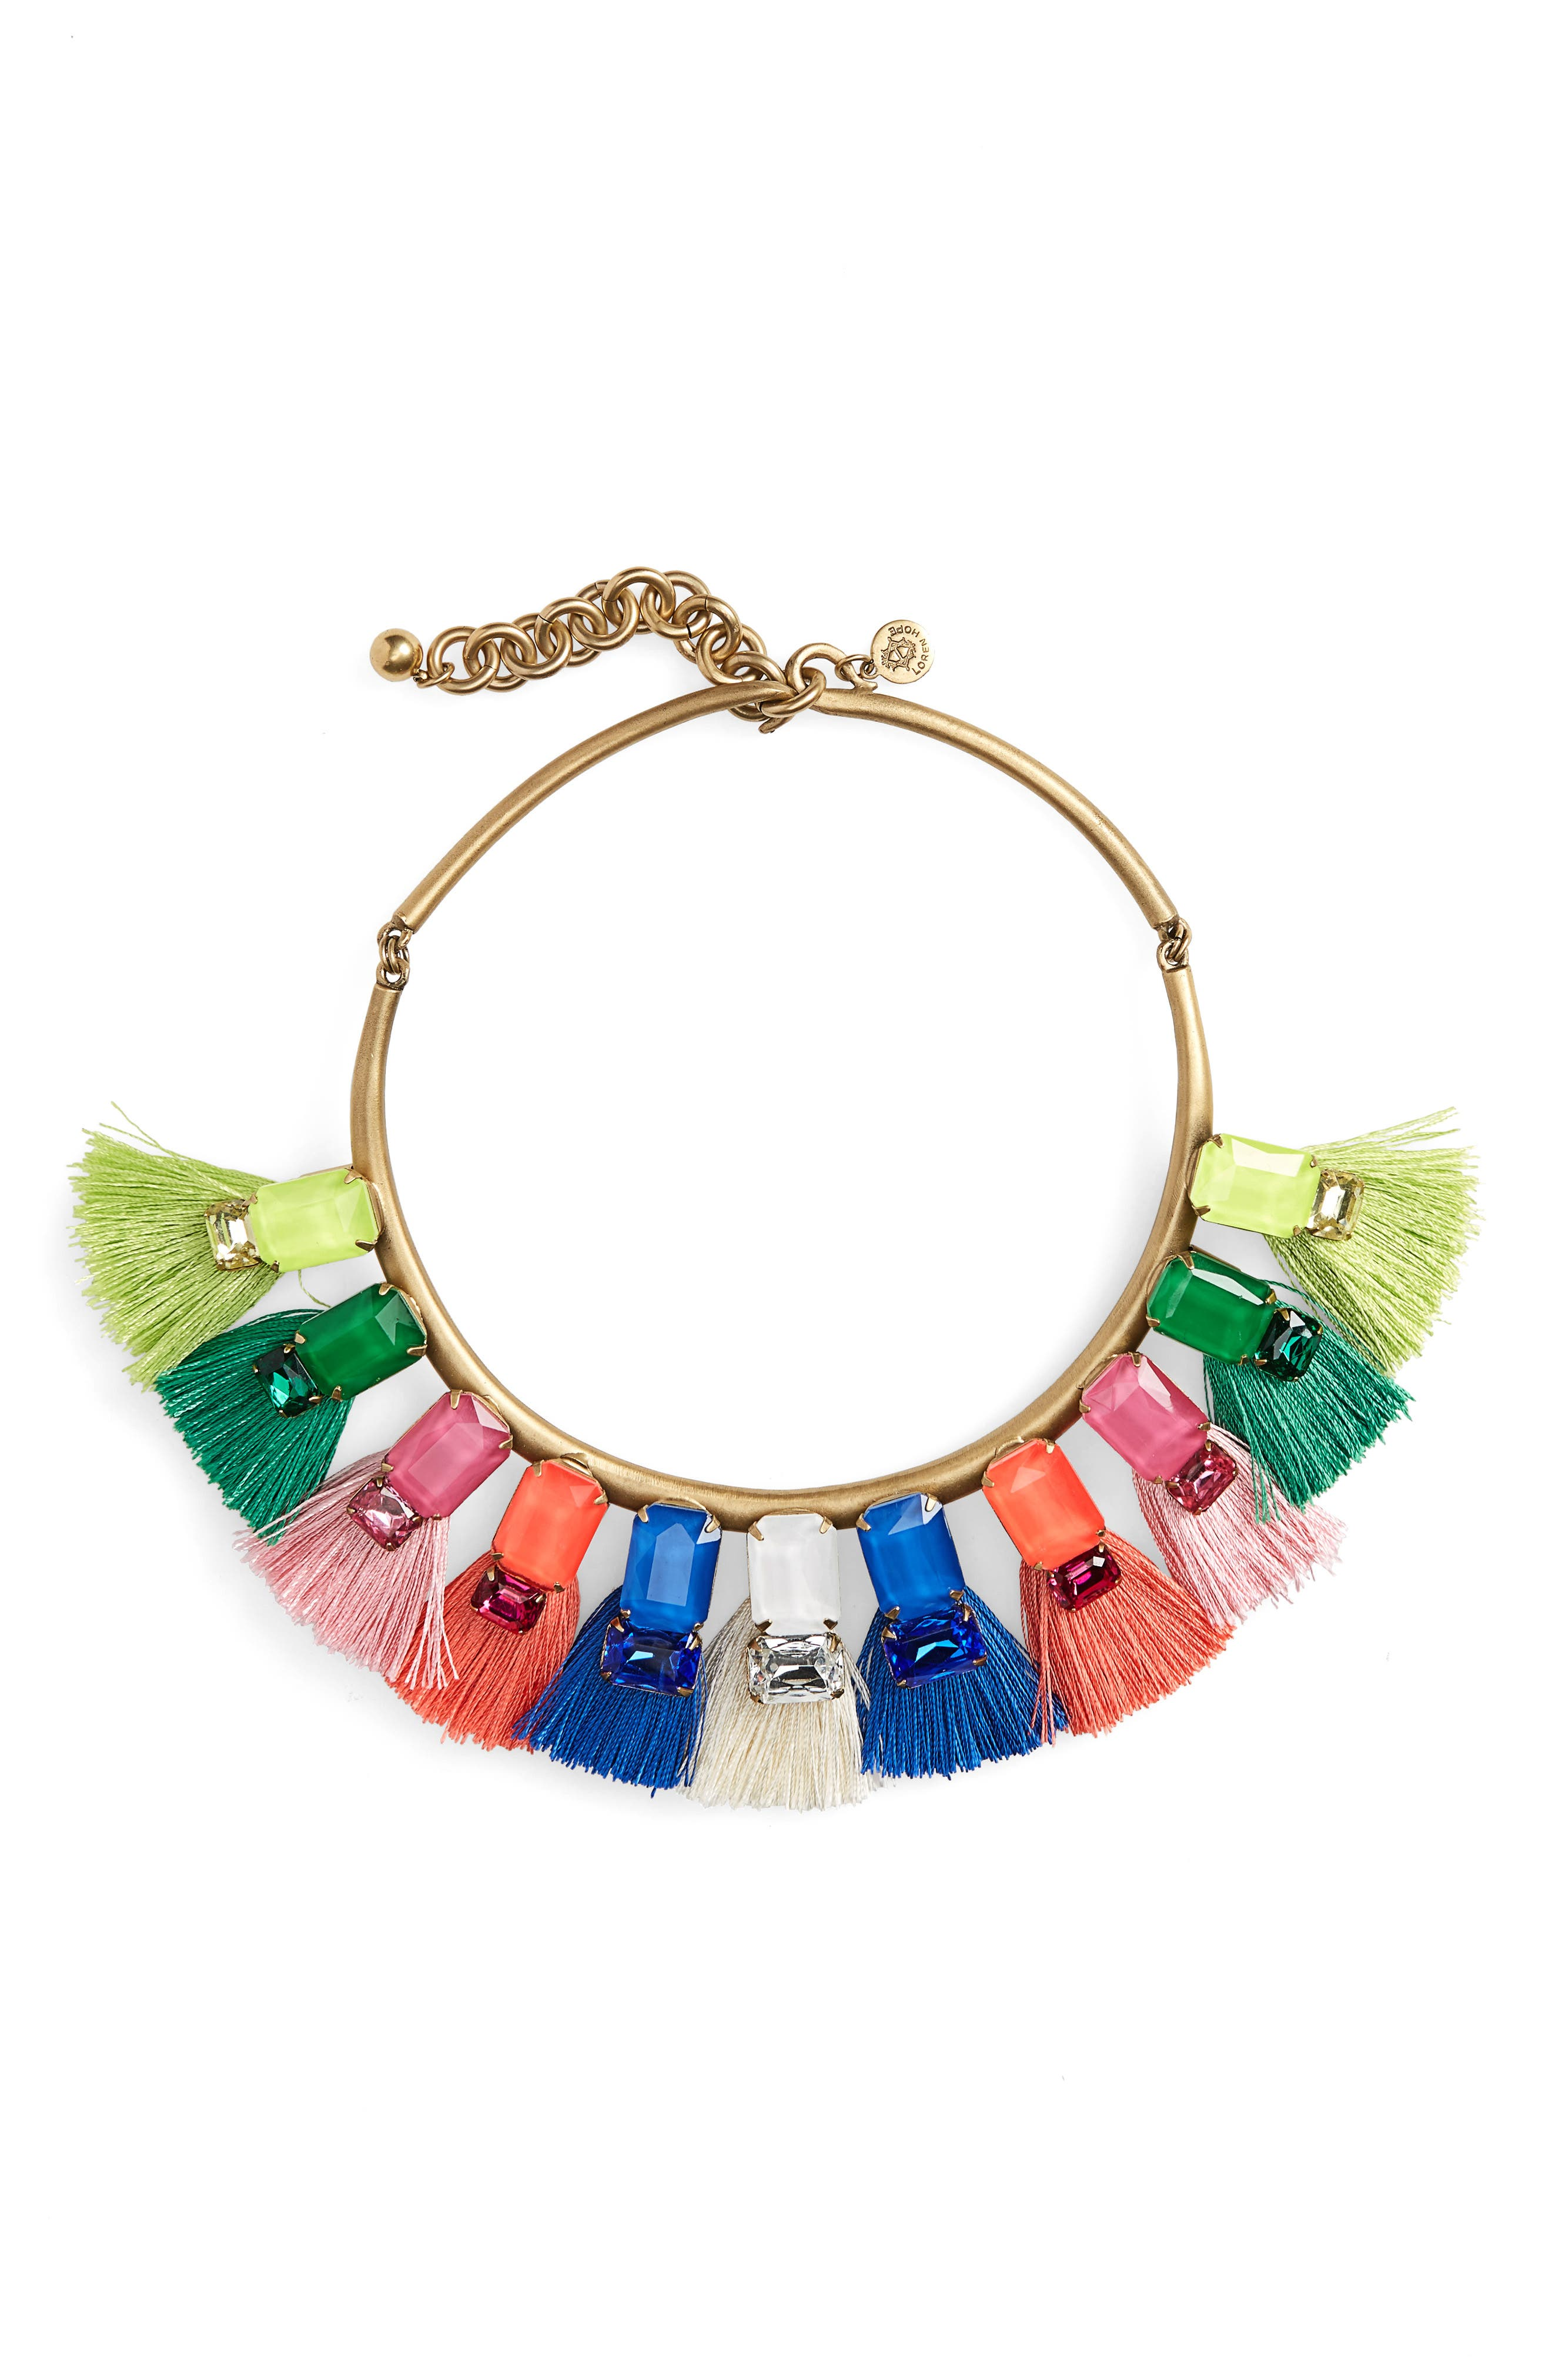 Main Image - Loren Hope Scarlet Tassel Collar Necklace